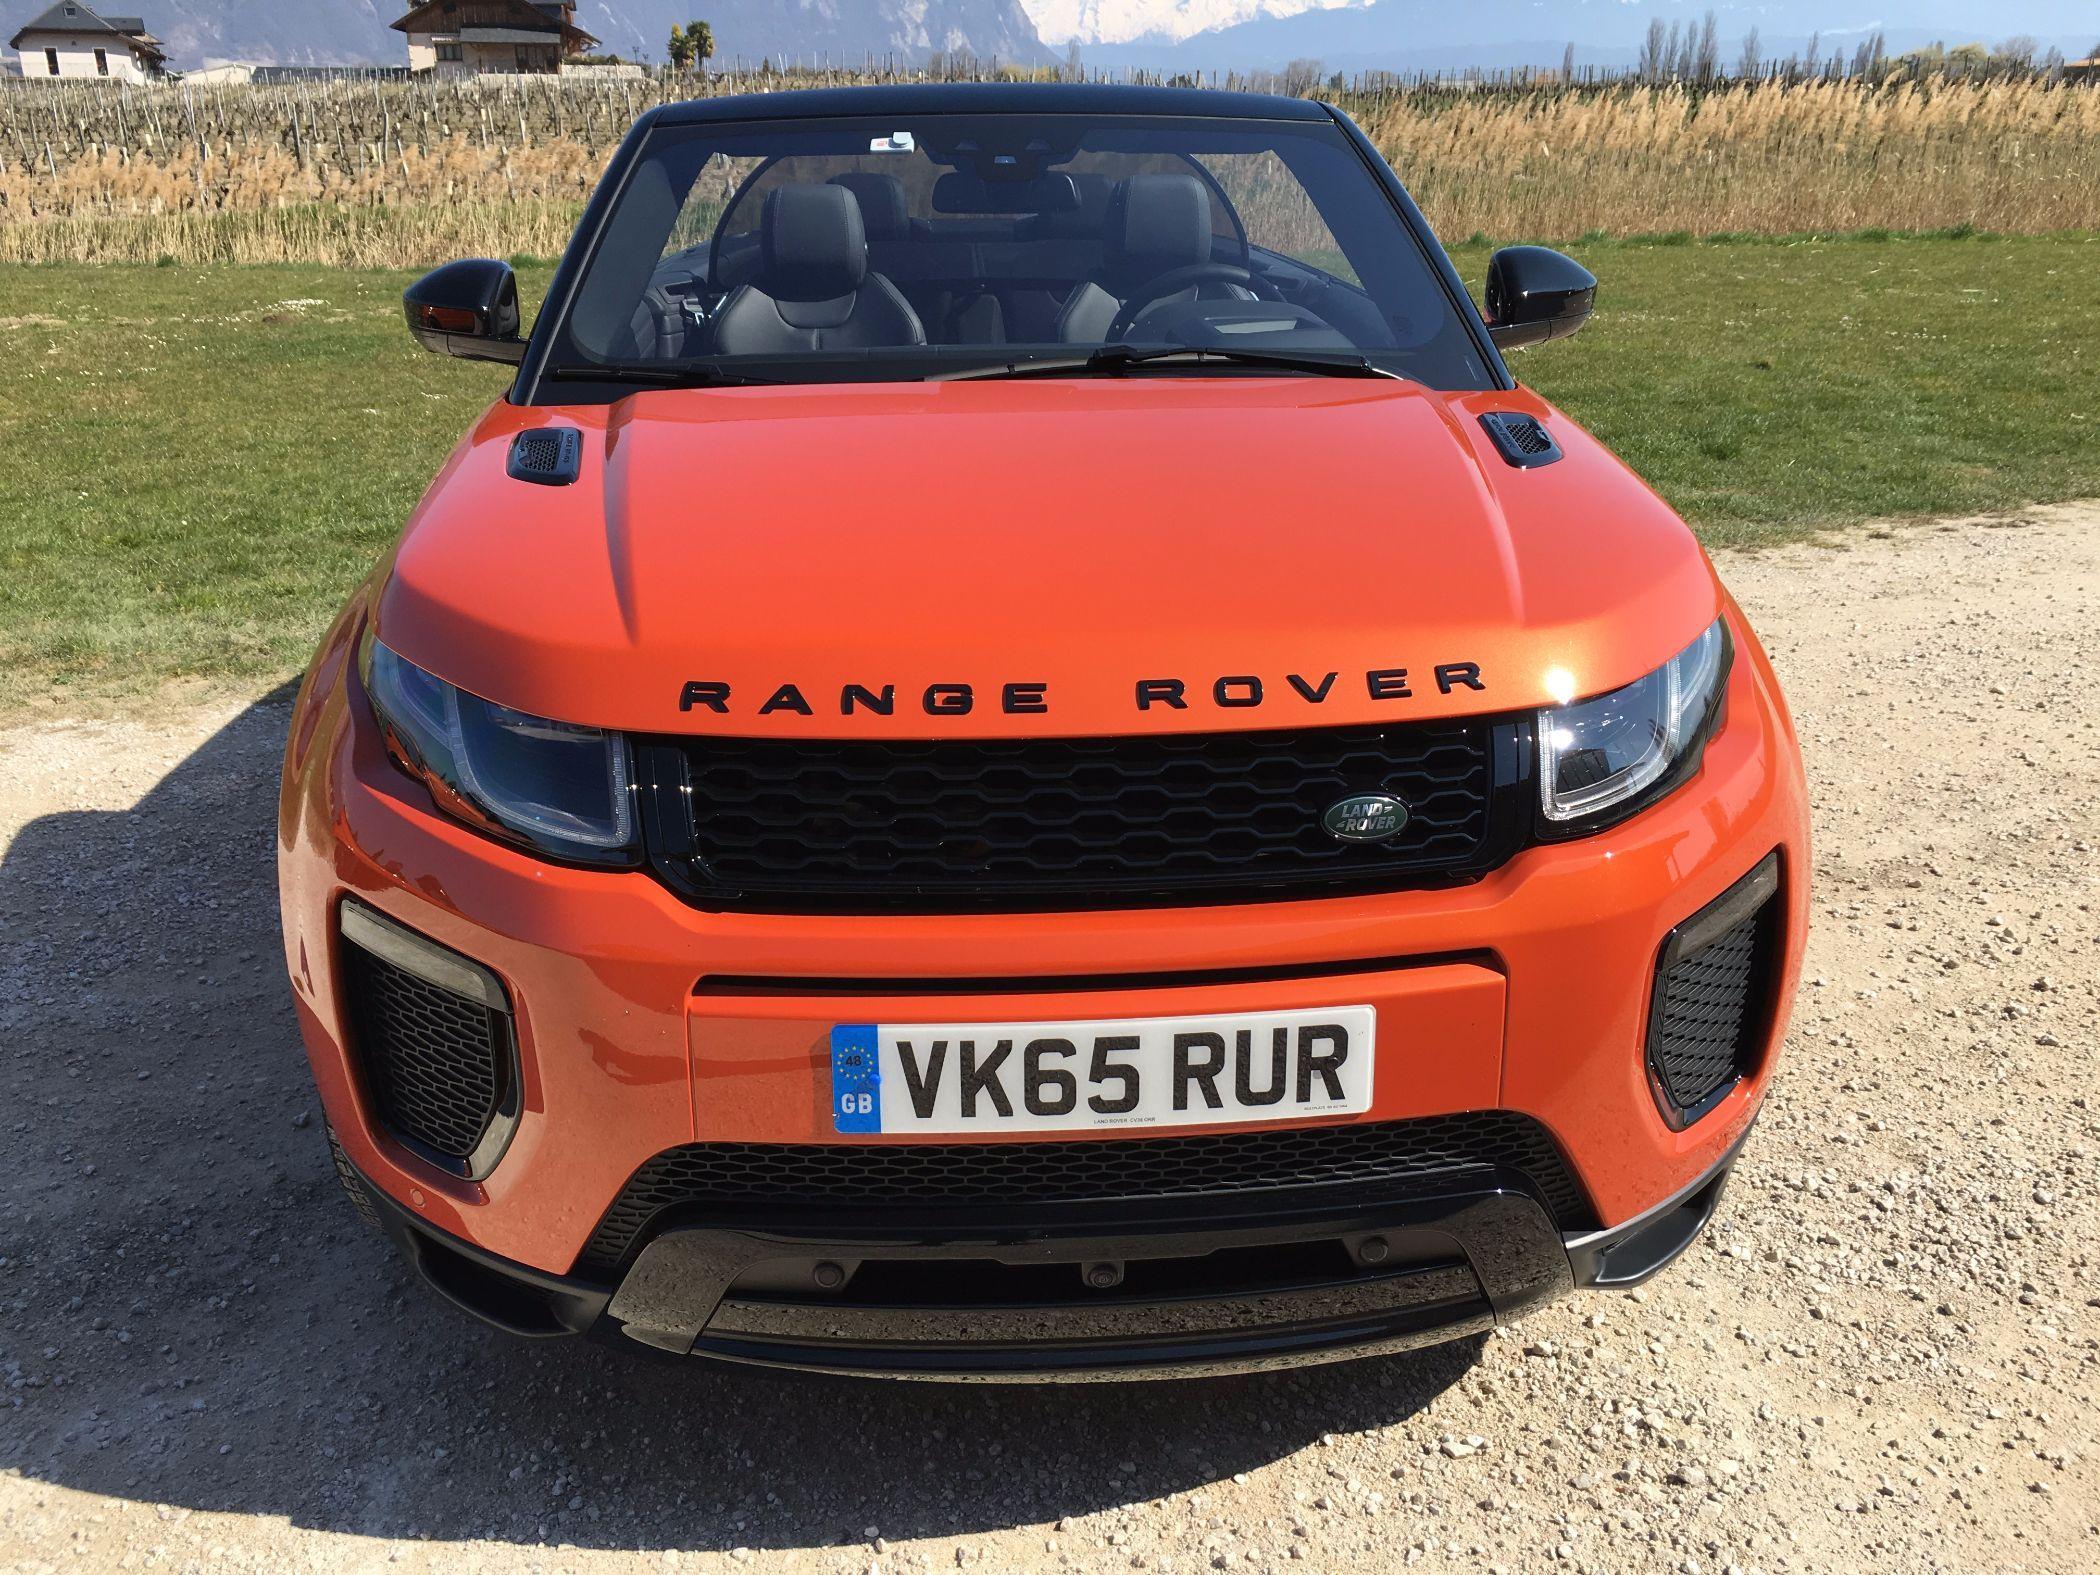 Range Rover Evoque Cabrio Front